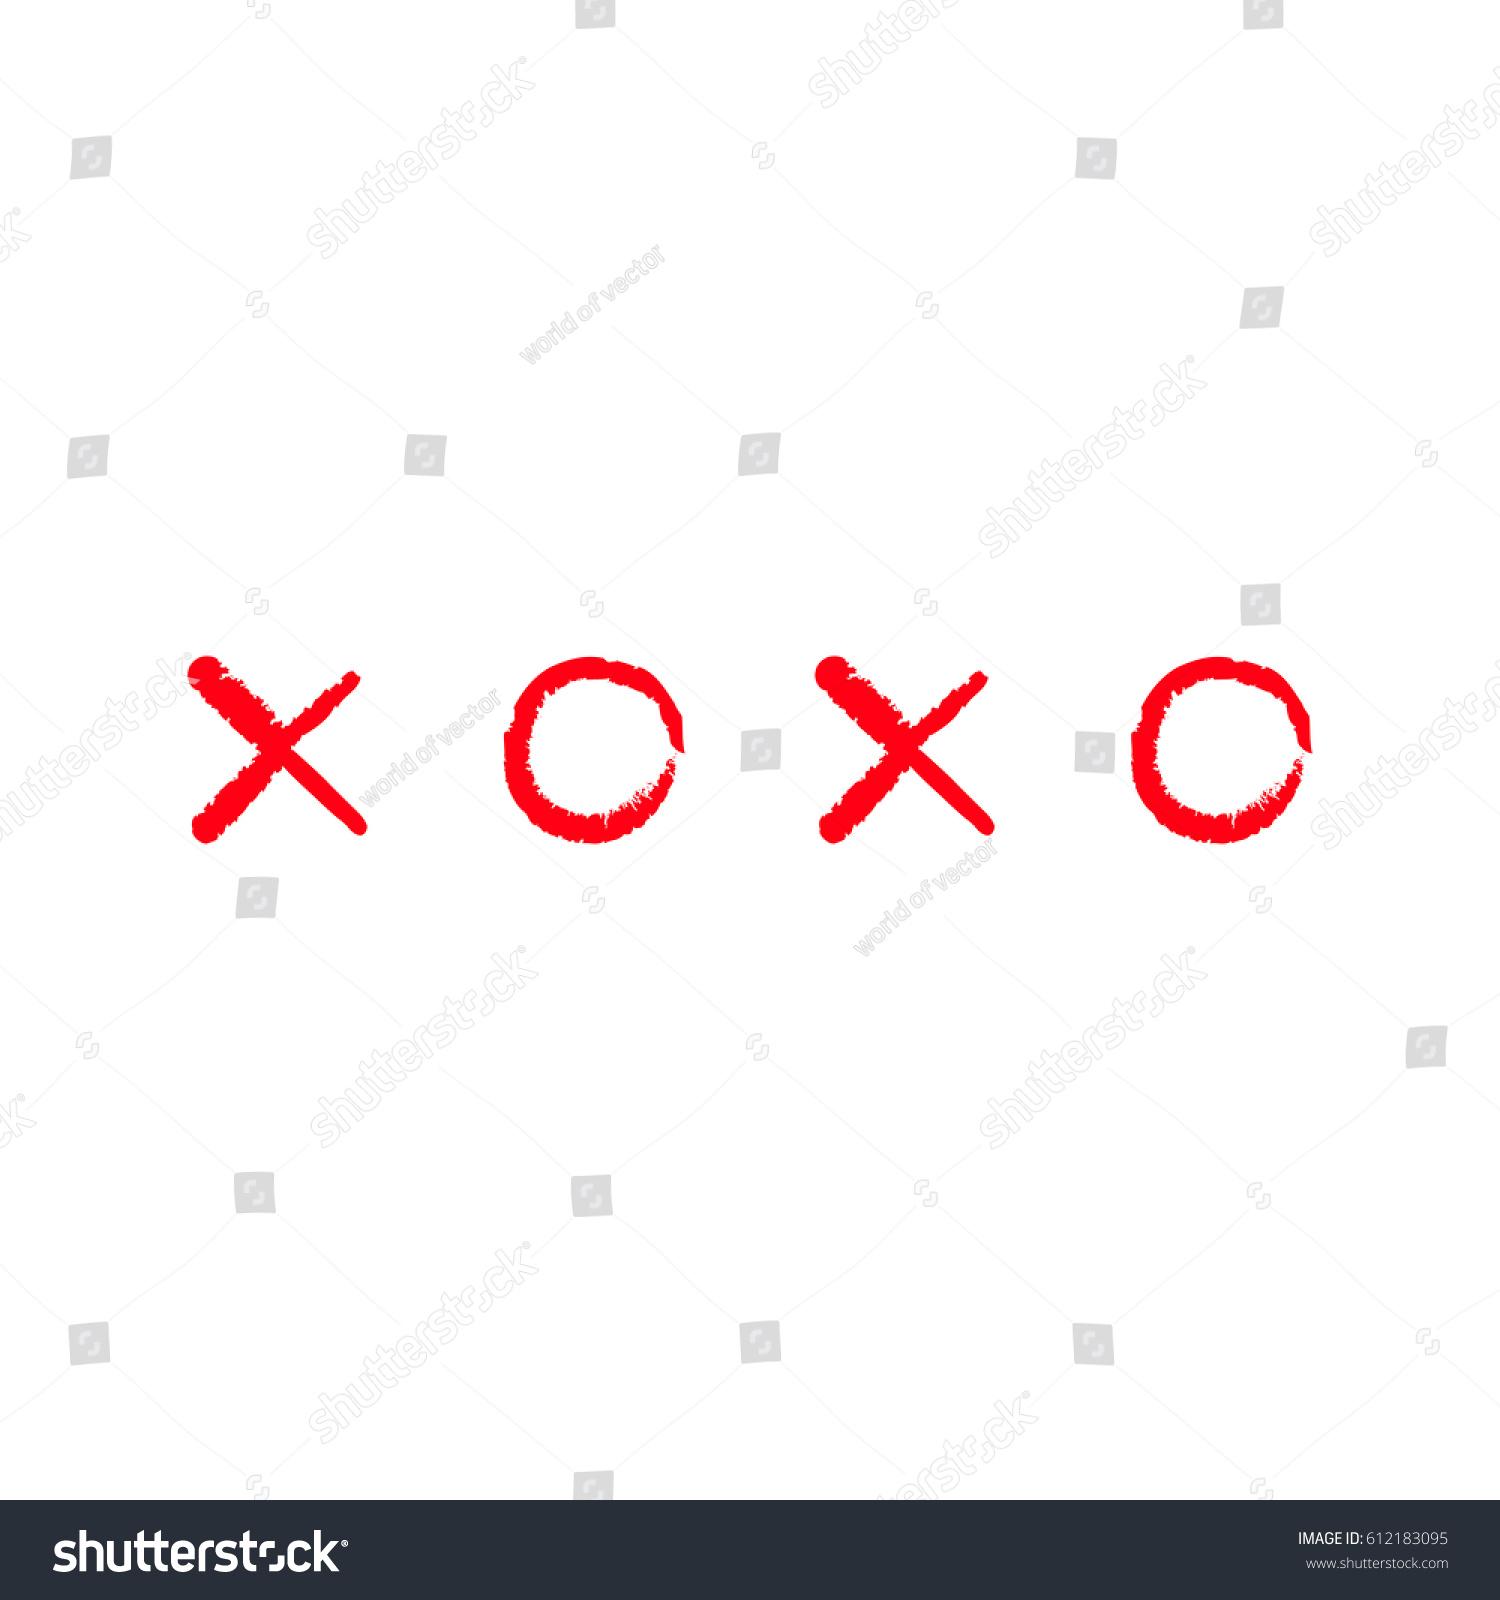 Xoxo Hugs Kisses Sign Symbol Mark Stock Illustration 612183095